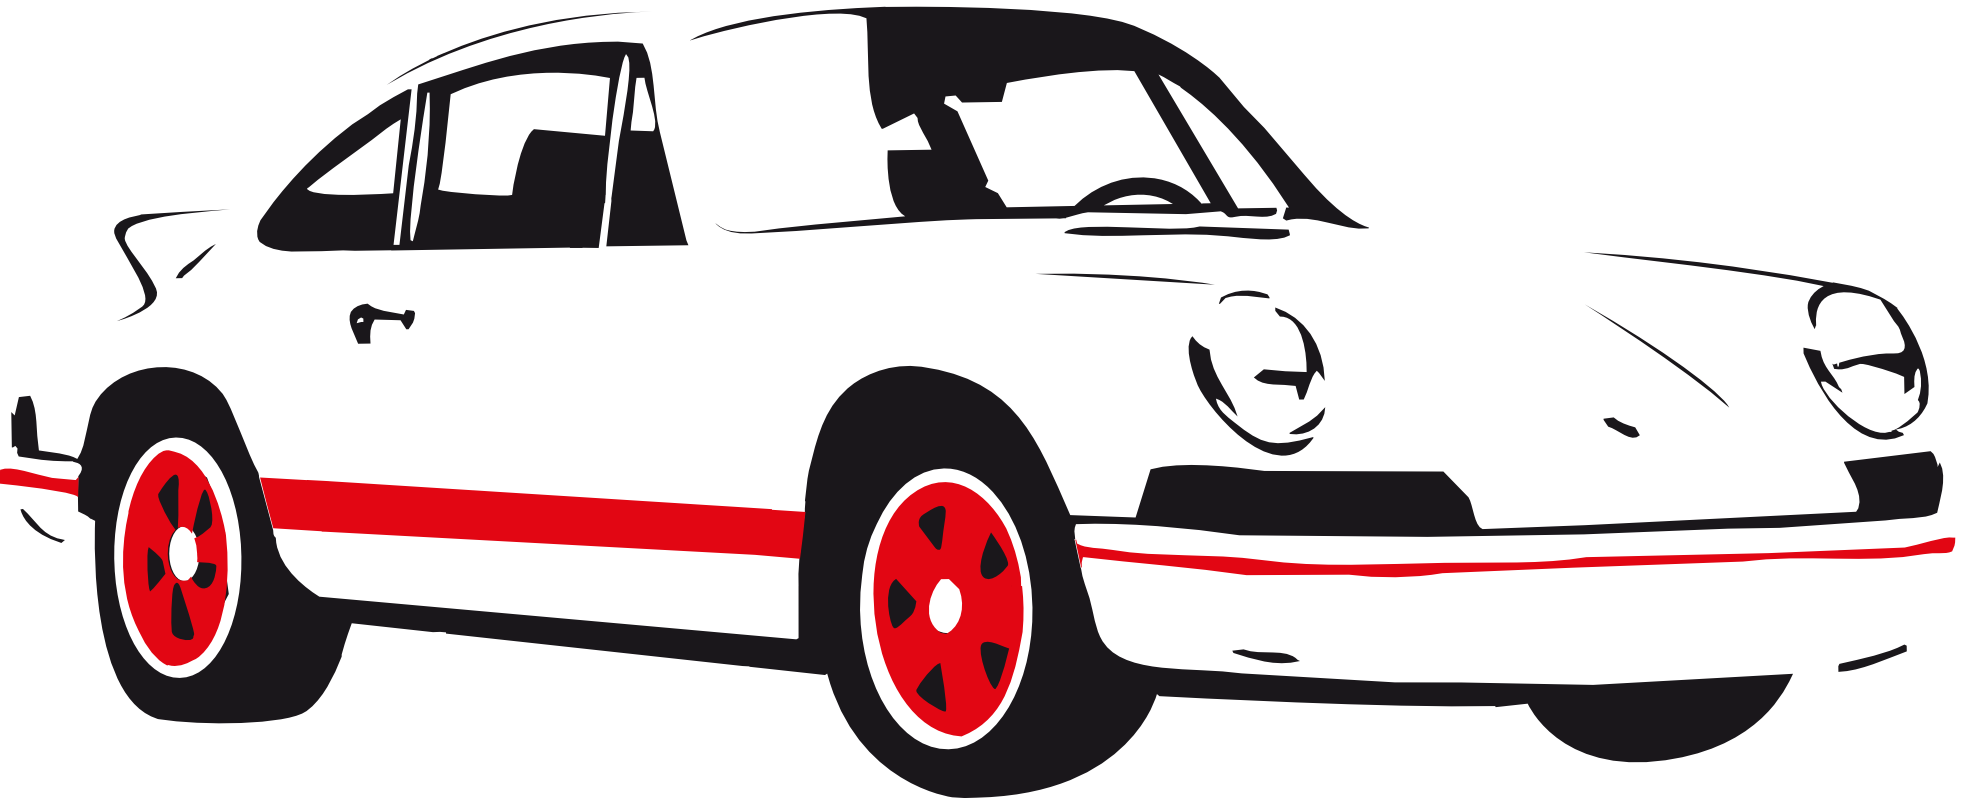 1969x798 Car Black And White Car Clipart Black And White Clipartfox